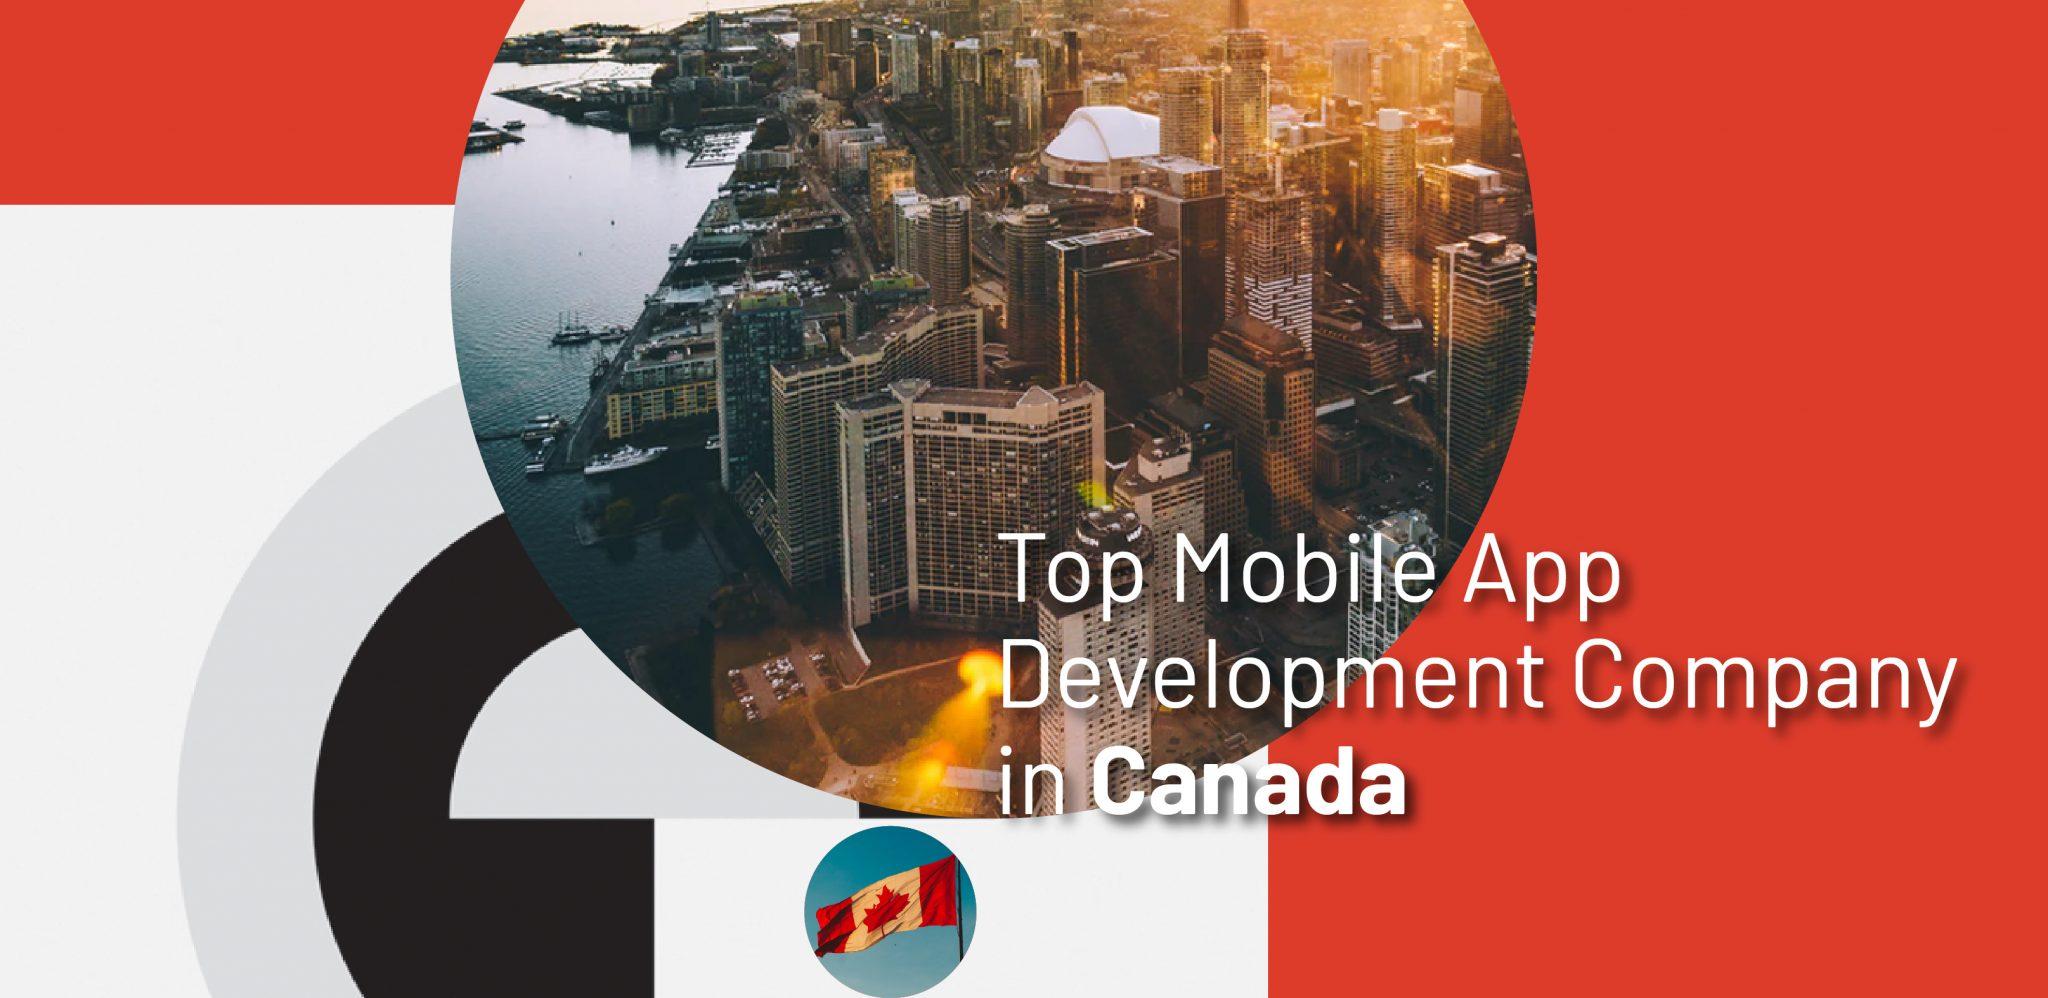 Top Mobile App Development Company in Canada - WebClues Infotech